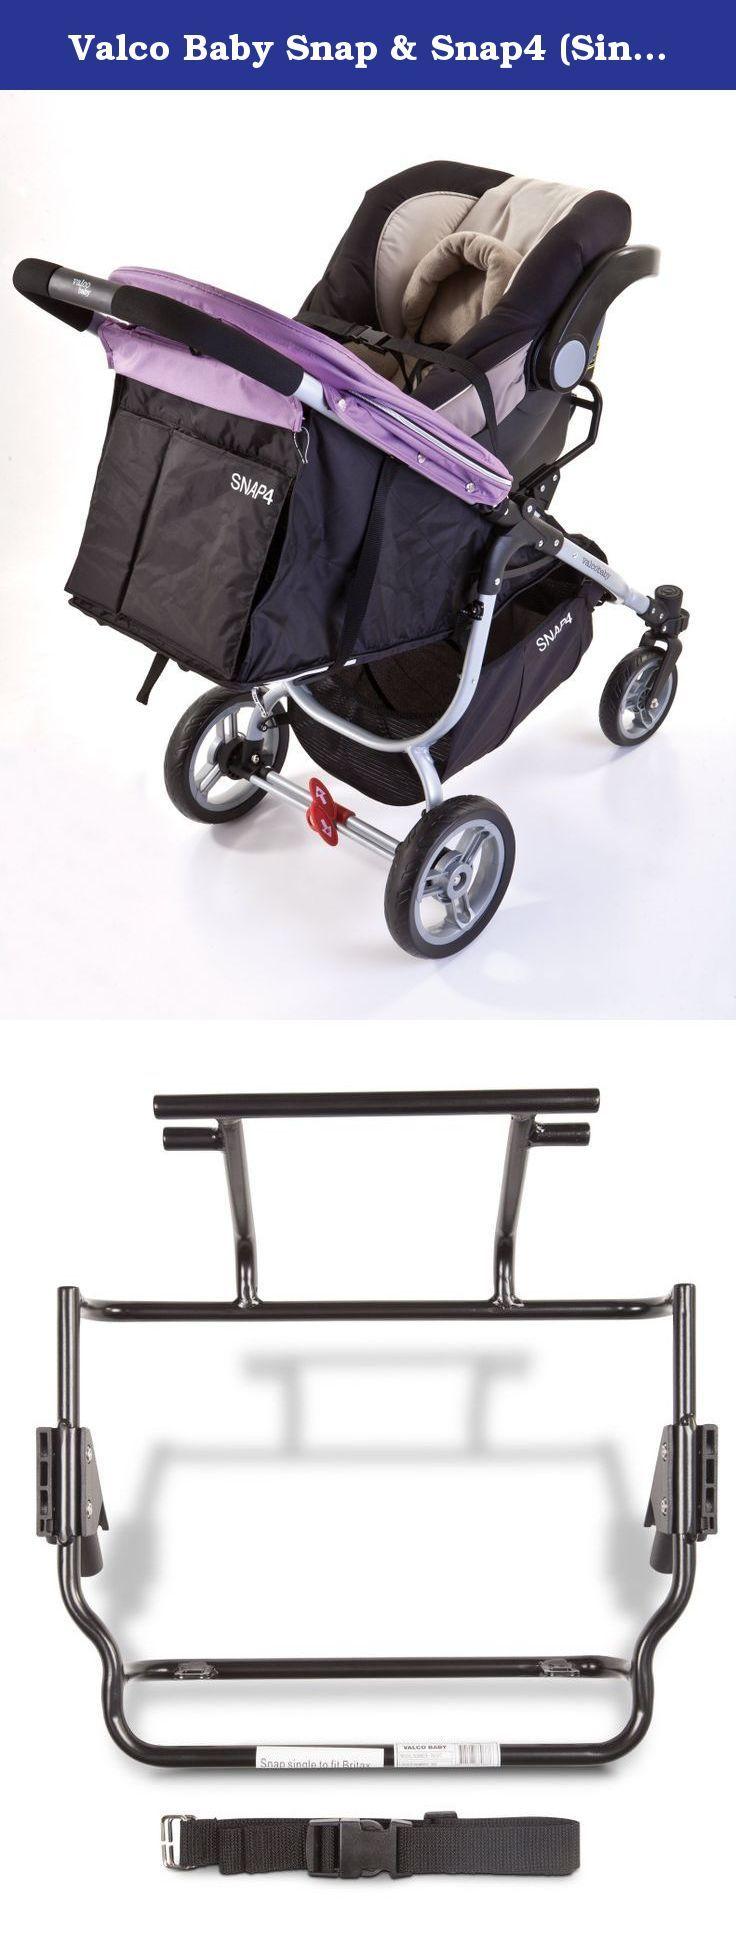 Valco Baby Snap & Snap4 (Single) Car Seat Adapter. Snap a